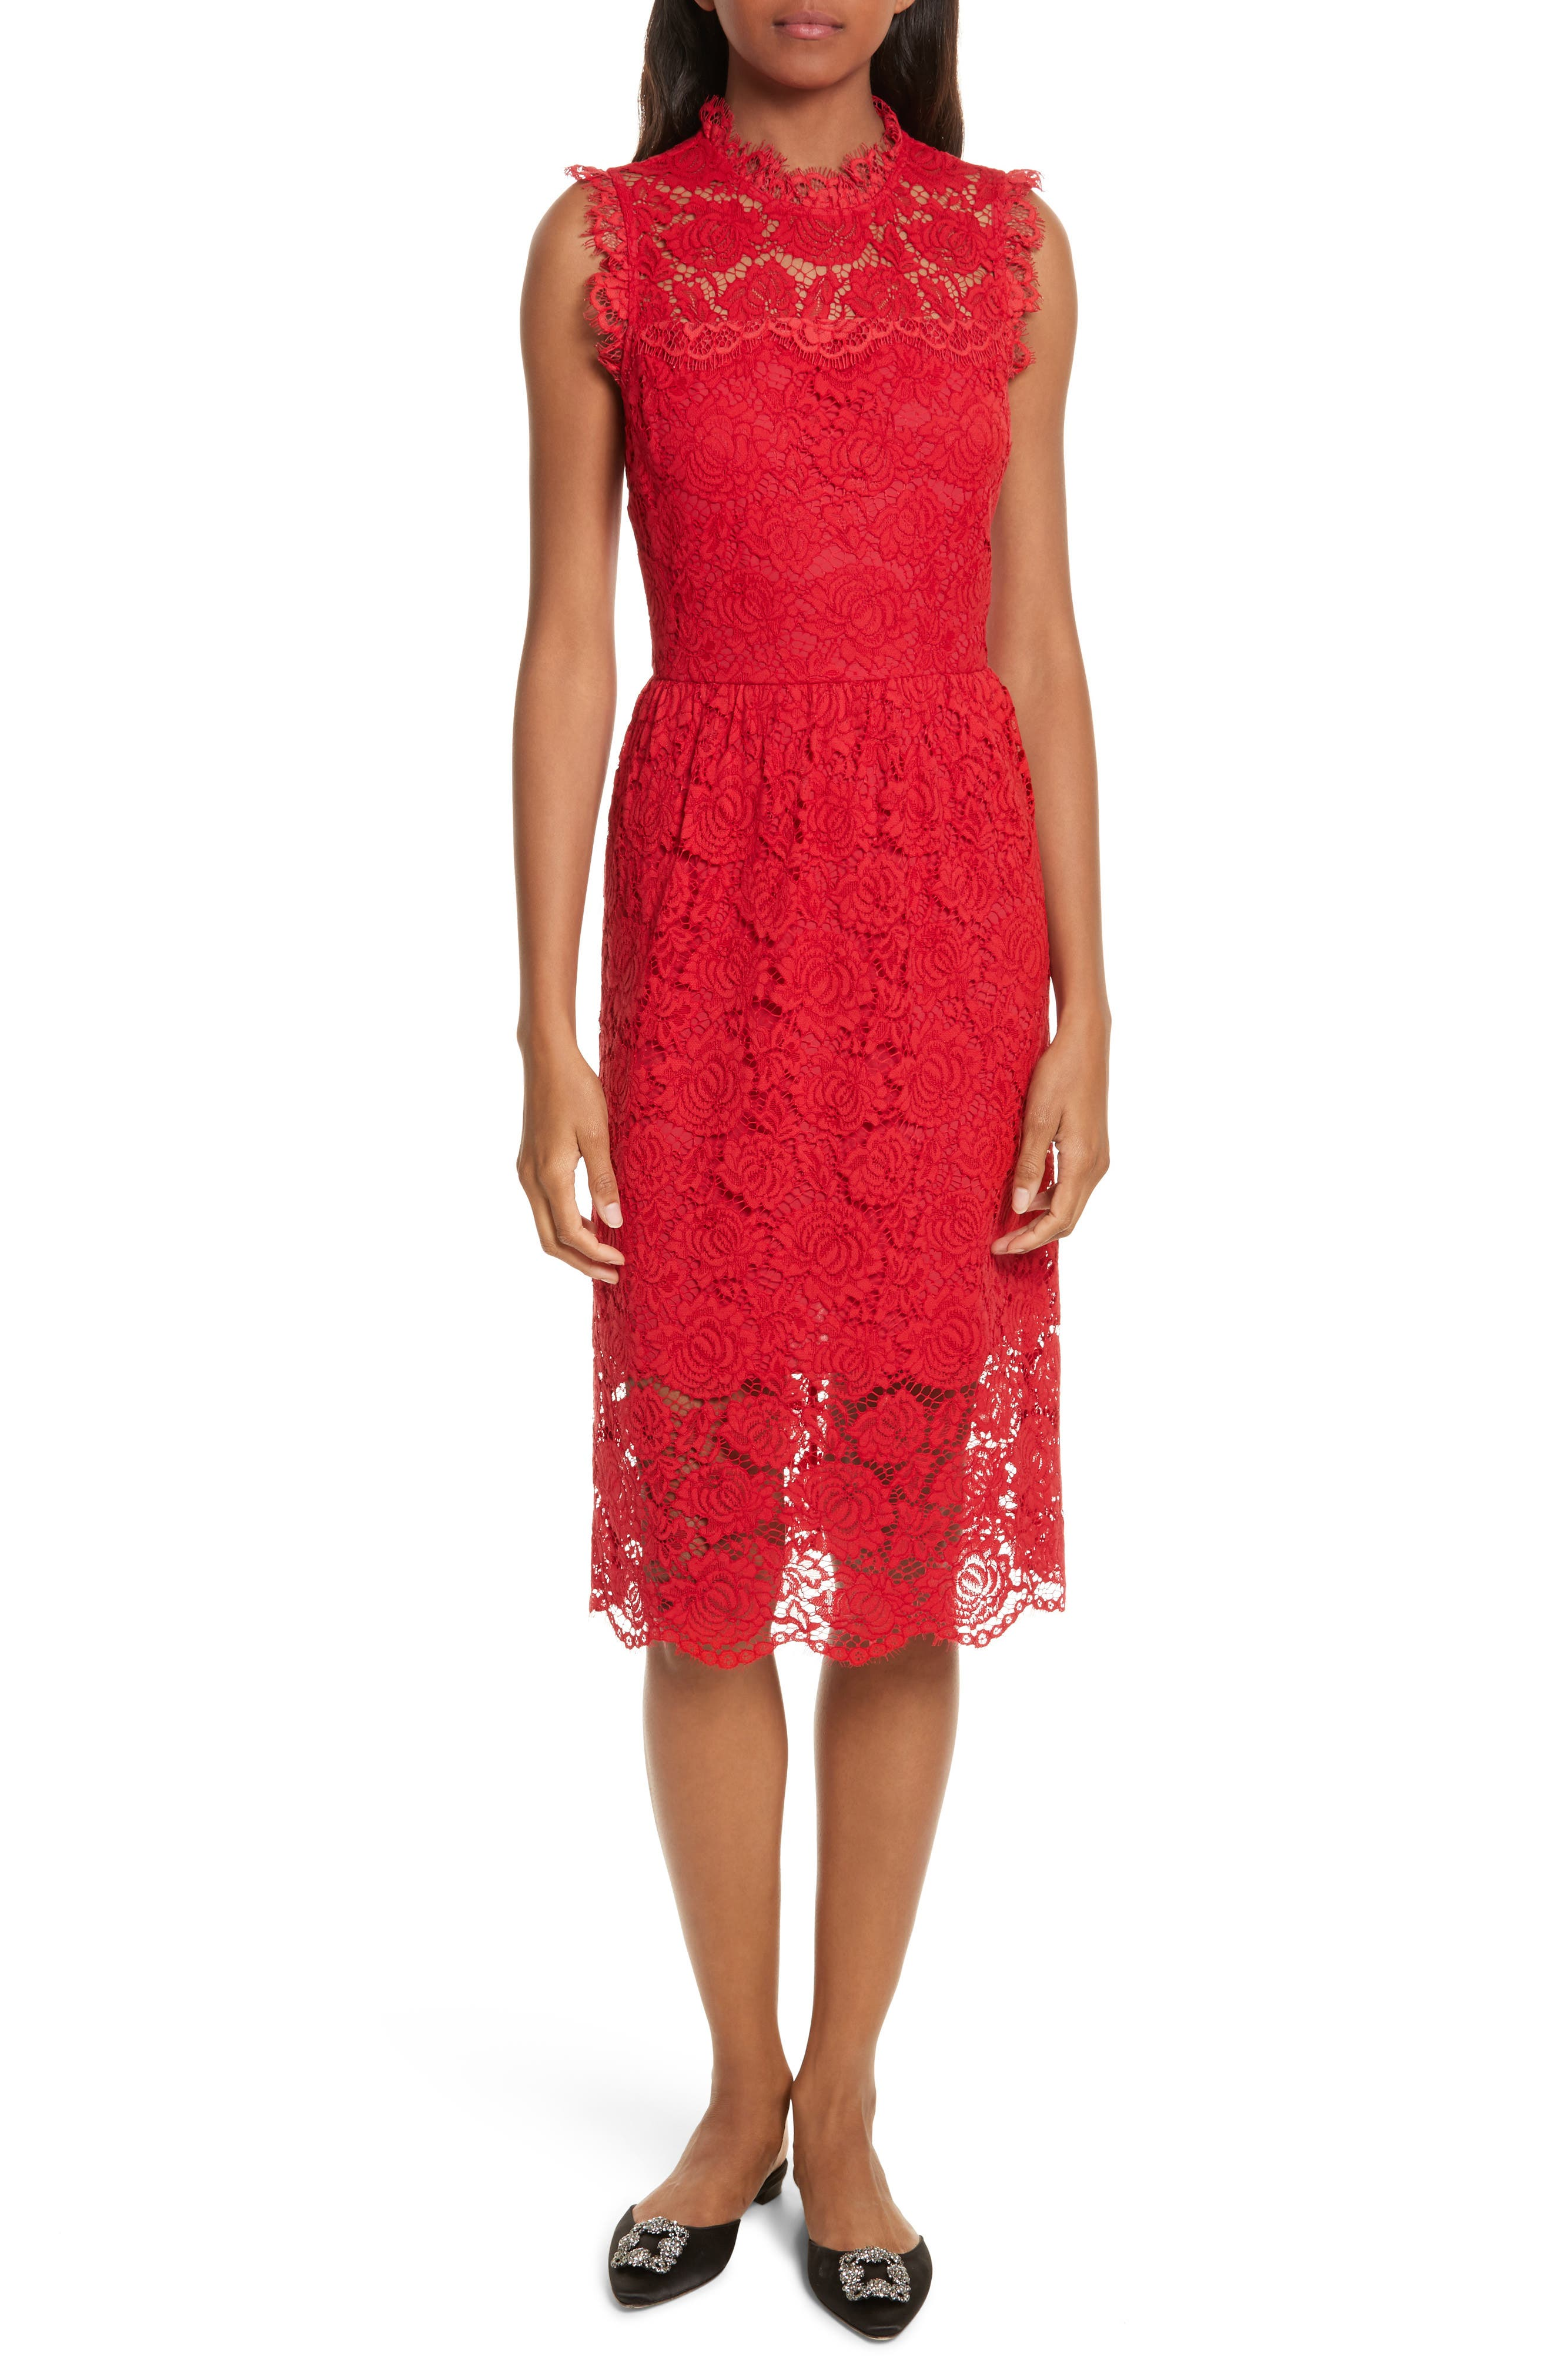 kate spade poppy lace dress,                             Main thumbnail 1, color,                             622